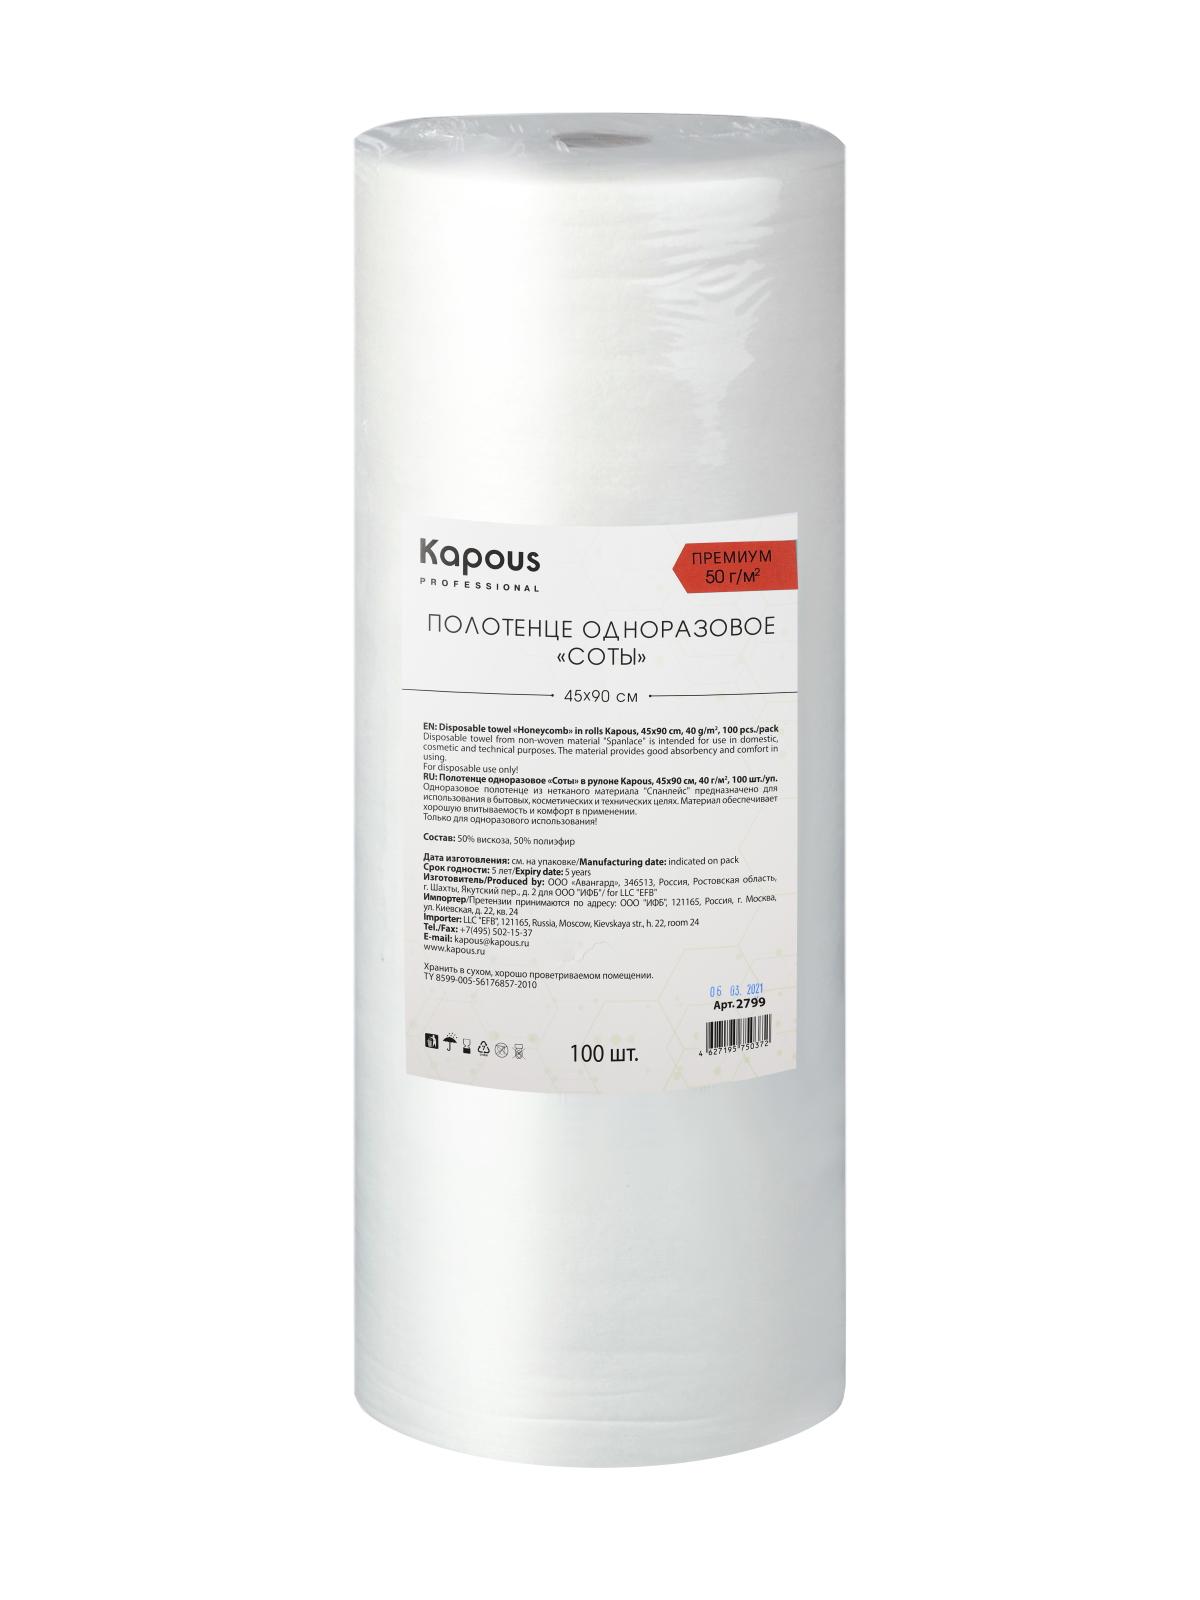 Купить Полотенце одноразовое KAPOUS PROFESSIONAL соты в рулоне 45 х 90 см 50г/м2 100 шт